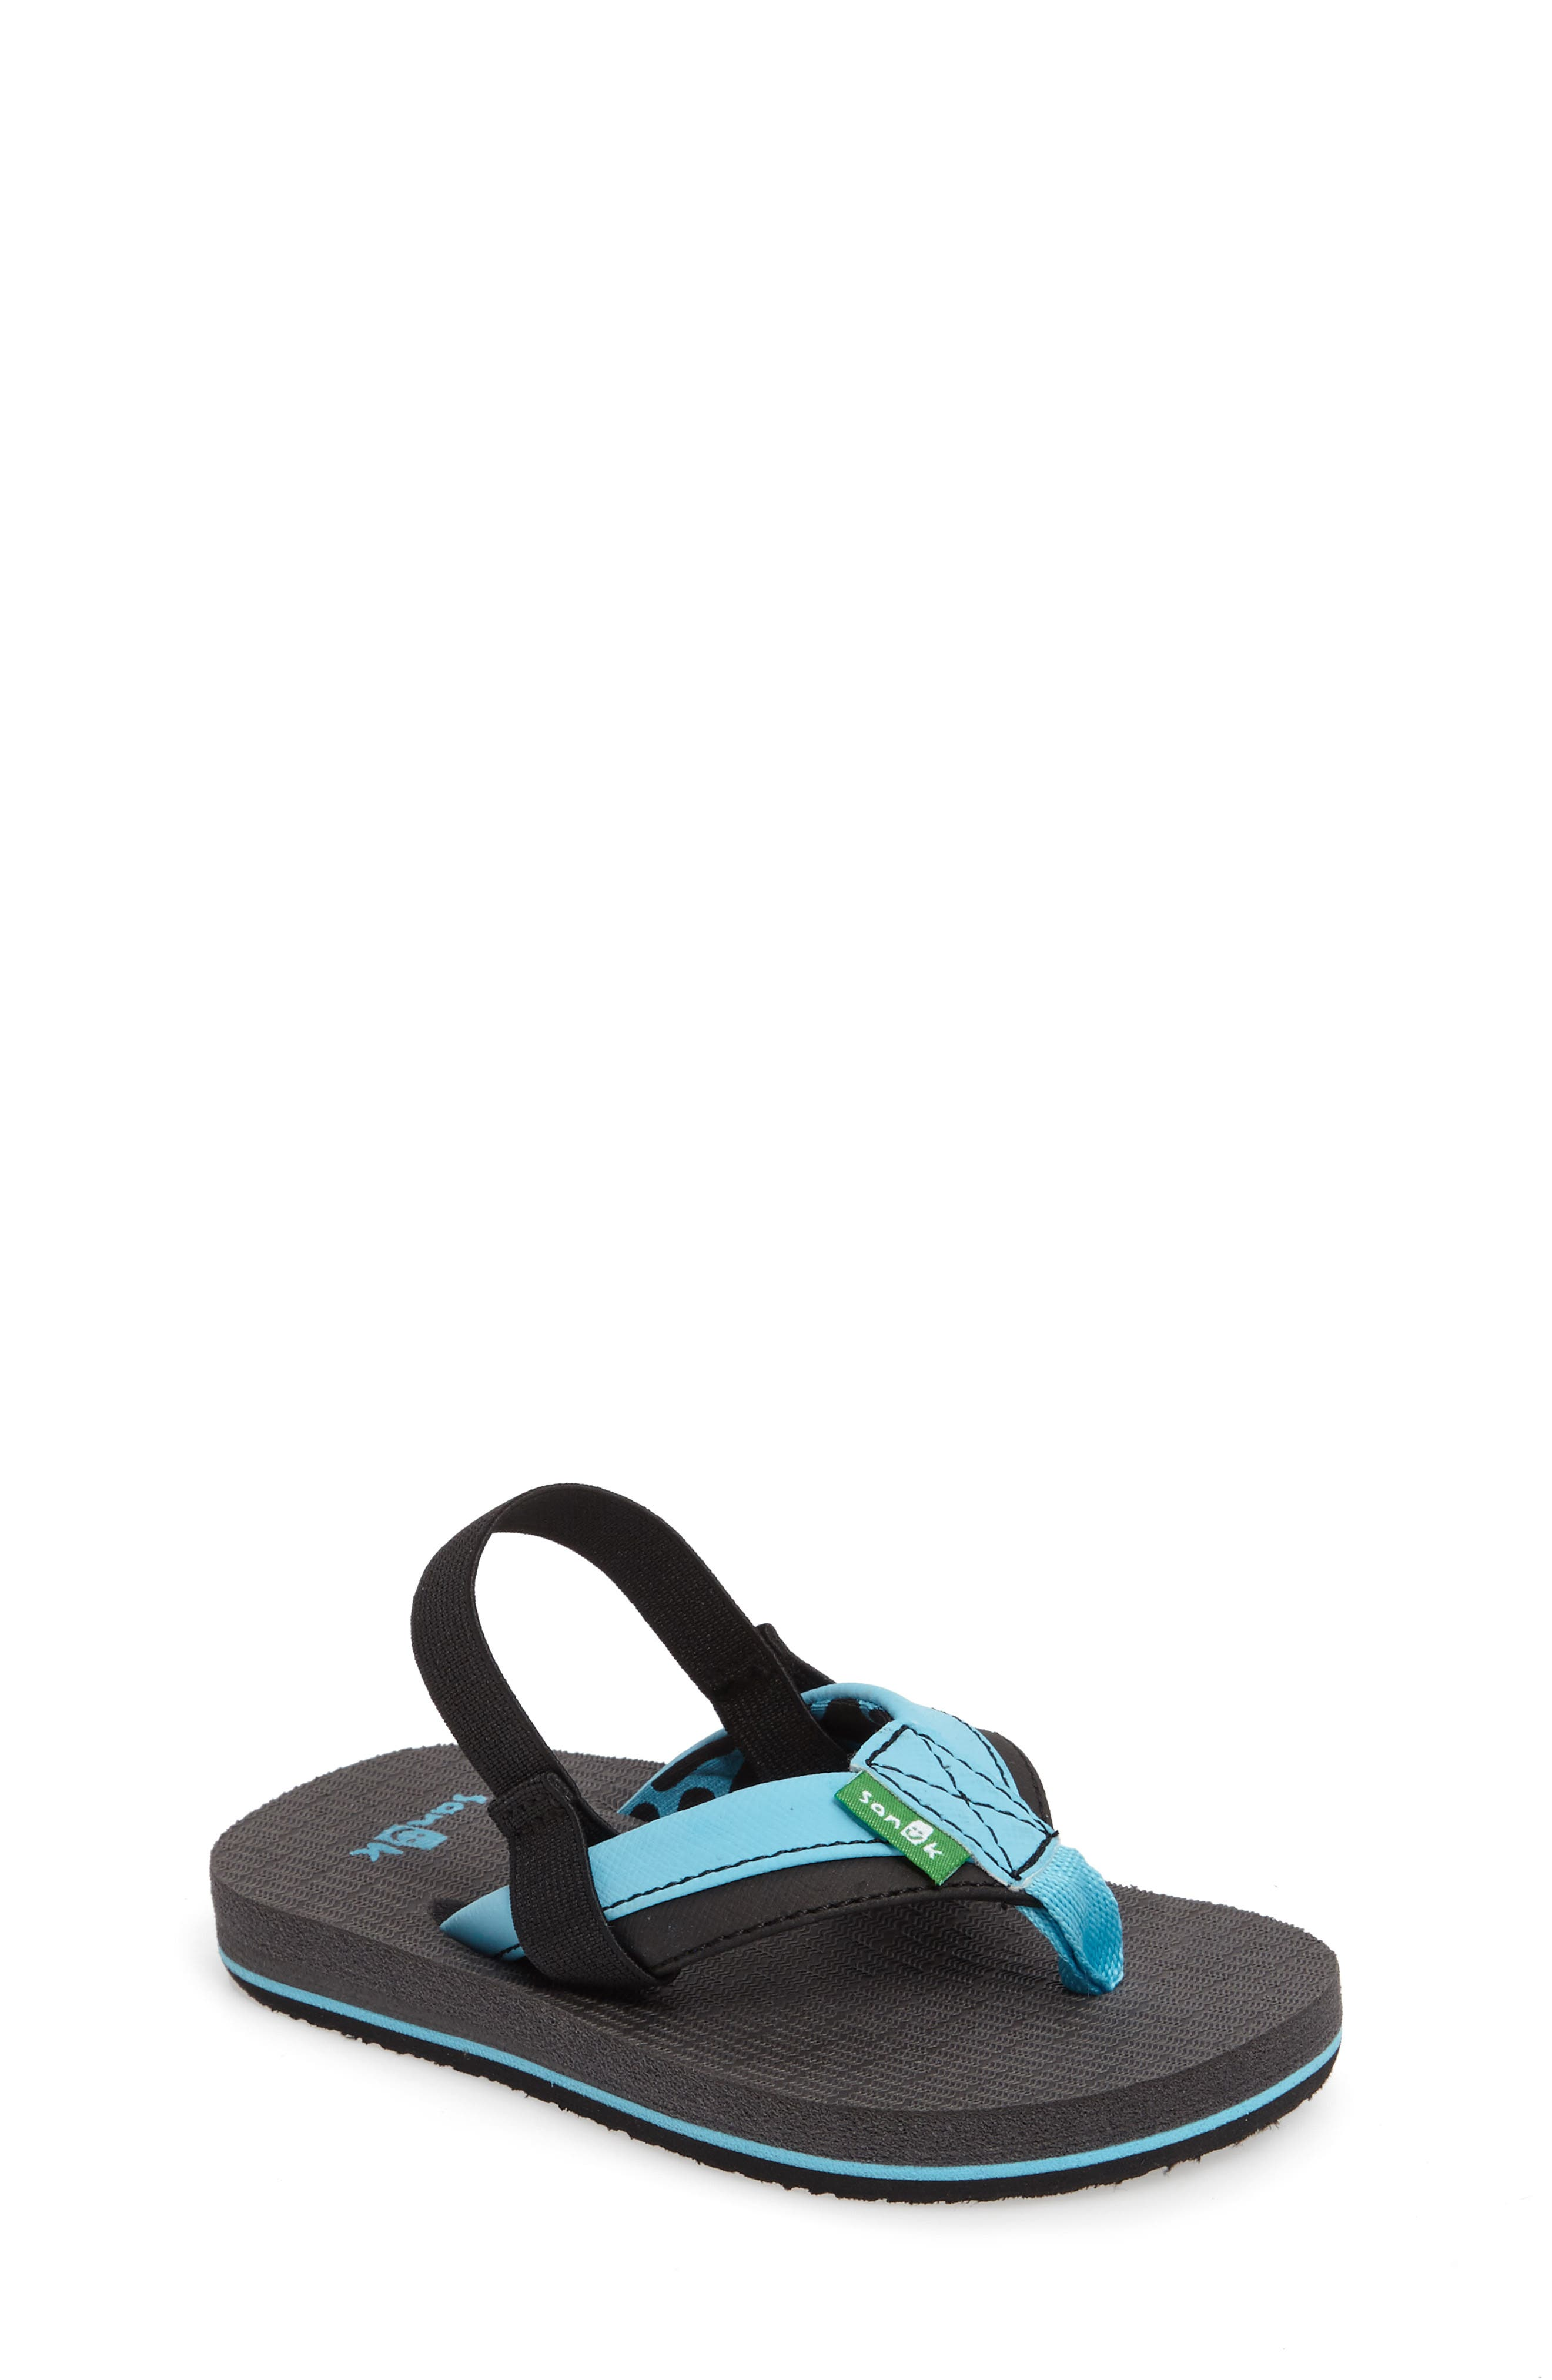 'Rootbeer Cozy' Lightweight Flip Flop Sandal,                             Main thumbnail 1, color,                             Aqua/ Black